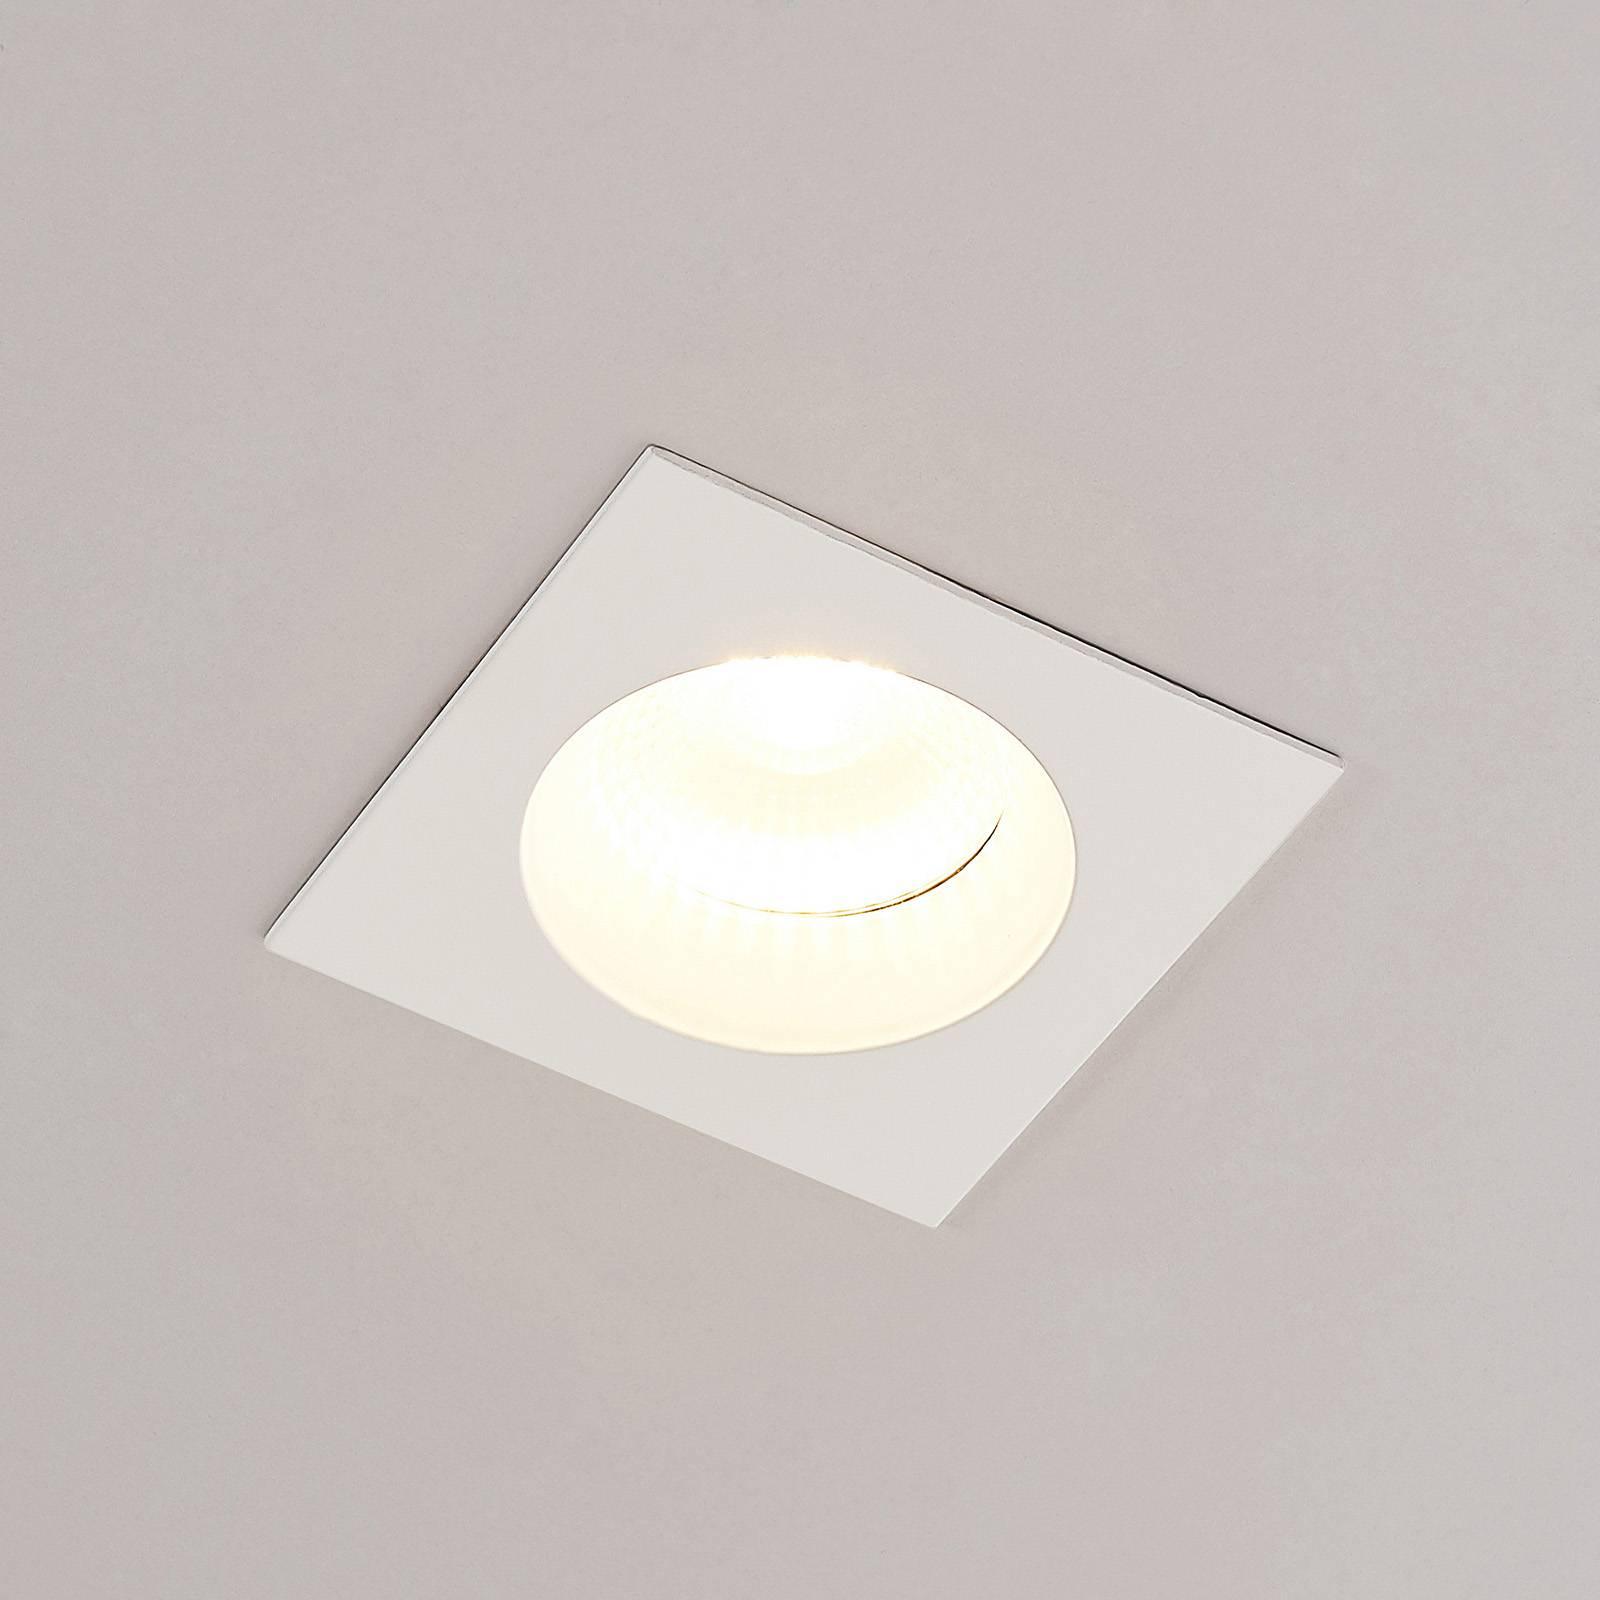 Arcchio Urdin LED inbouwspot hoekig IP65, 10,6W